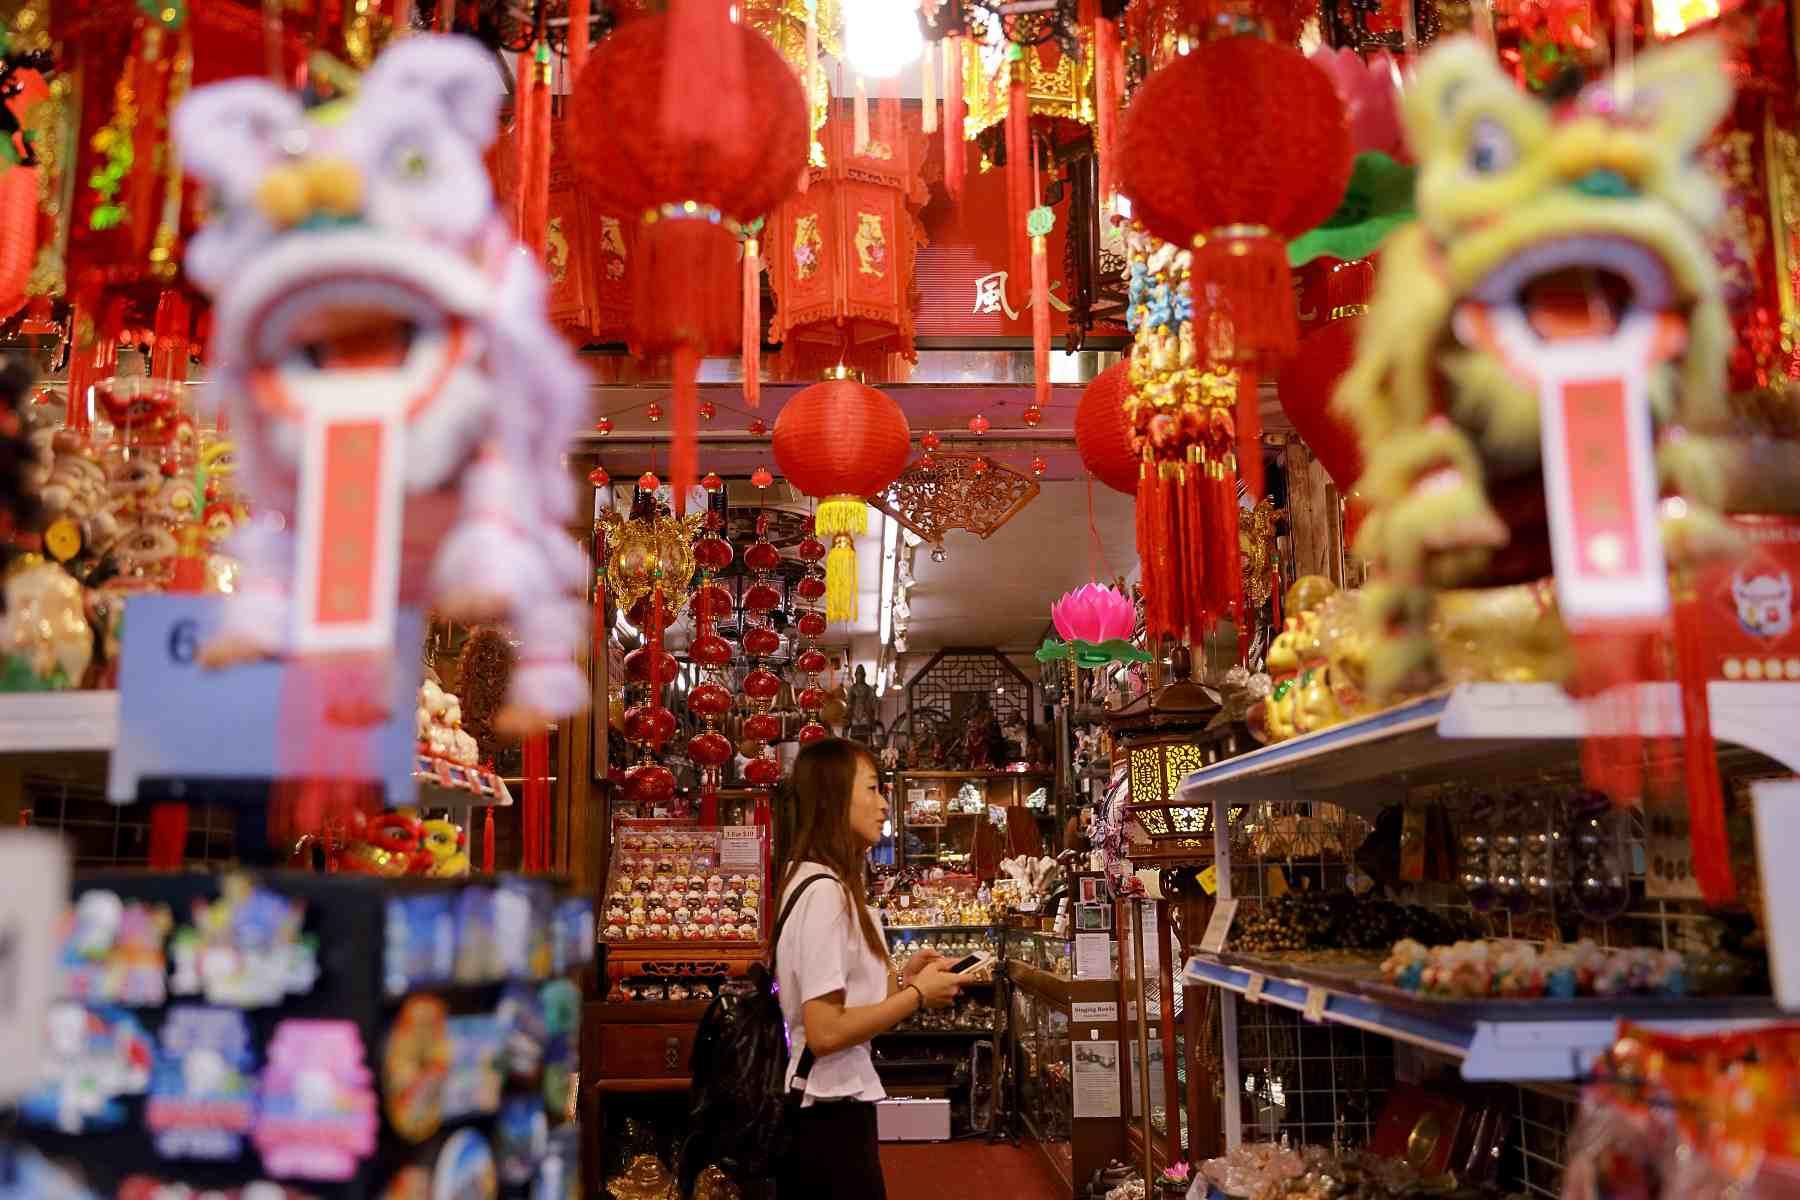 Browsing at Chinatown shop in Singapore